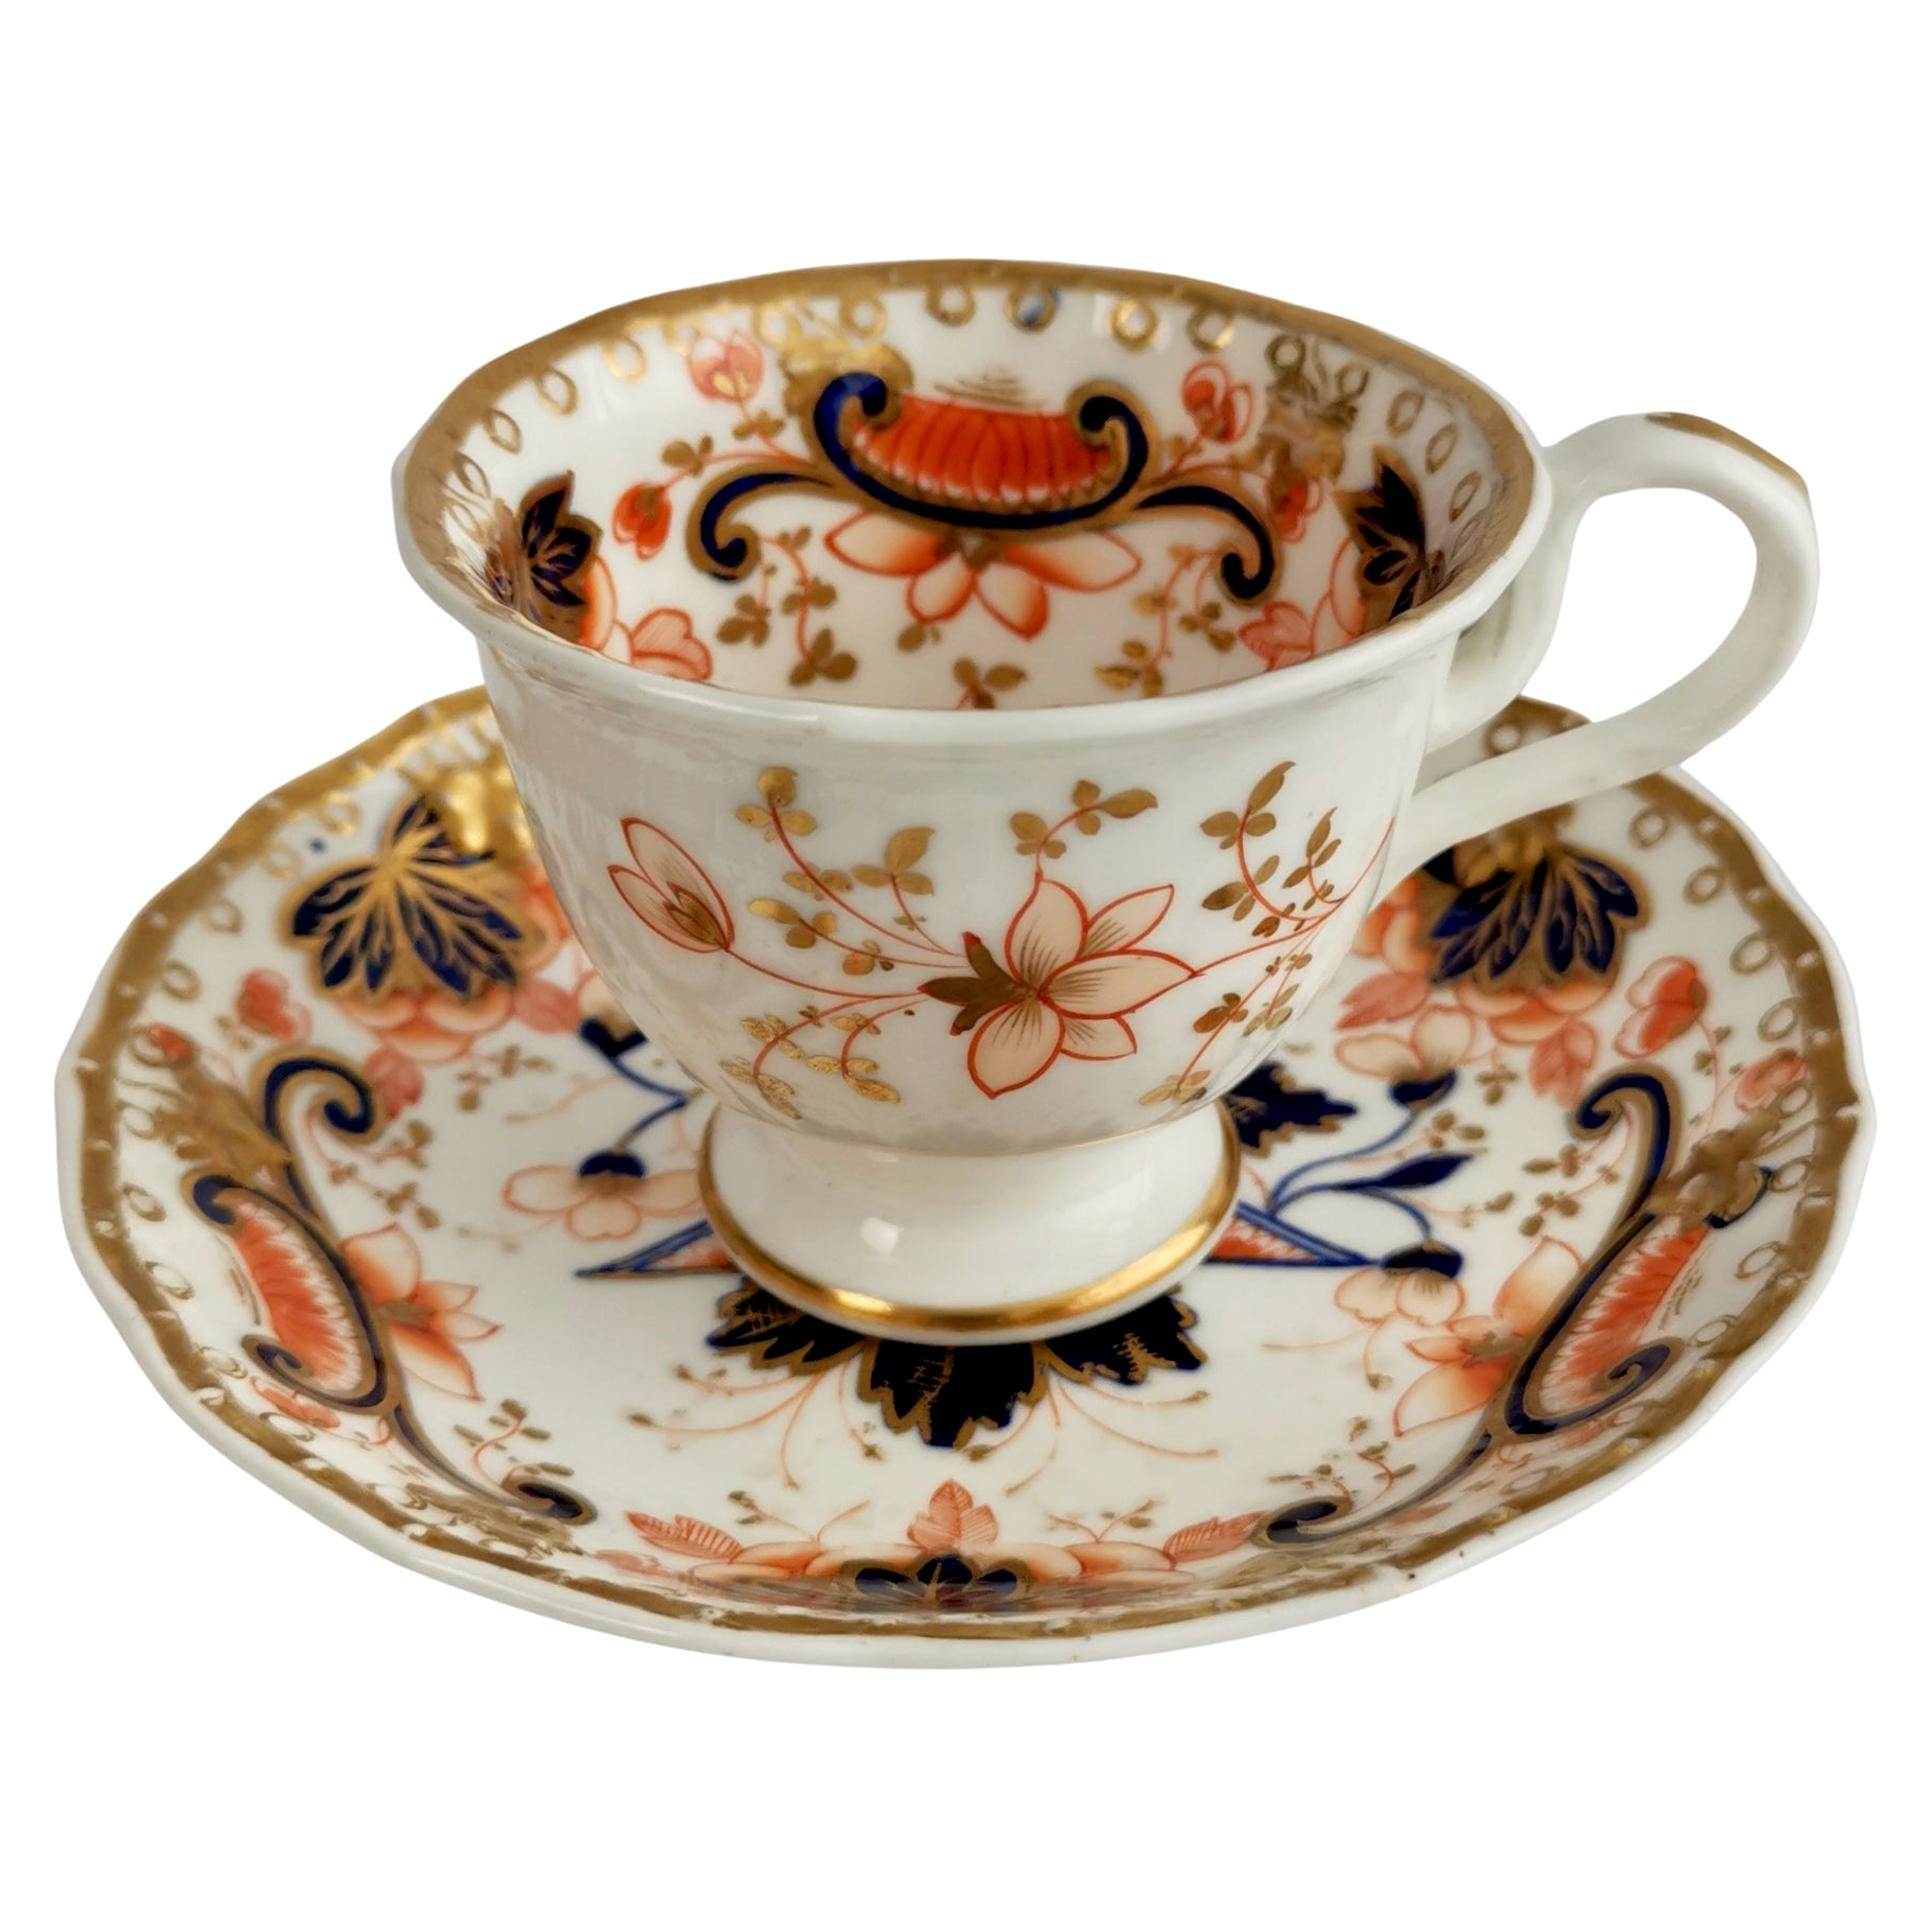 Samuel Alcock Porcelain Coffee Cup, Orange Imari Flowers, Rococo Revival ca 1830